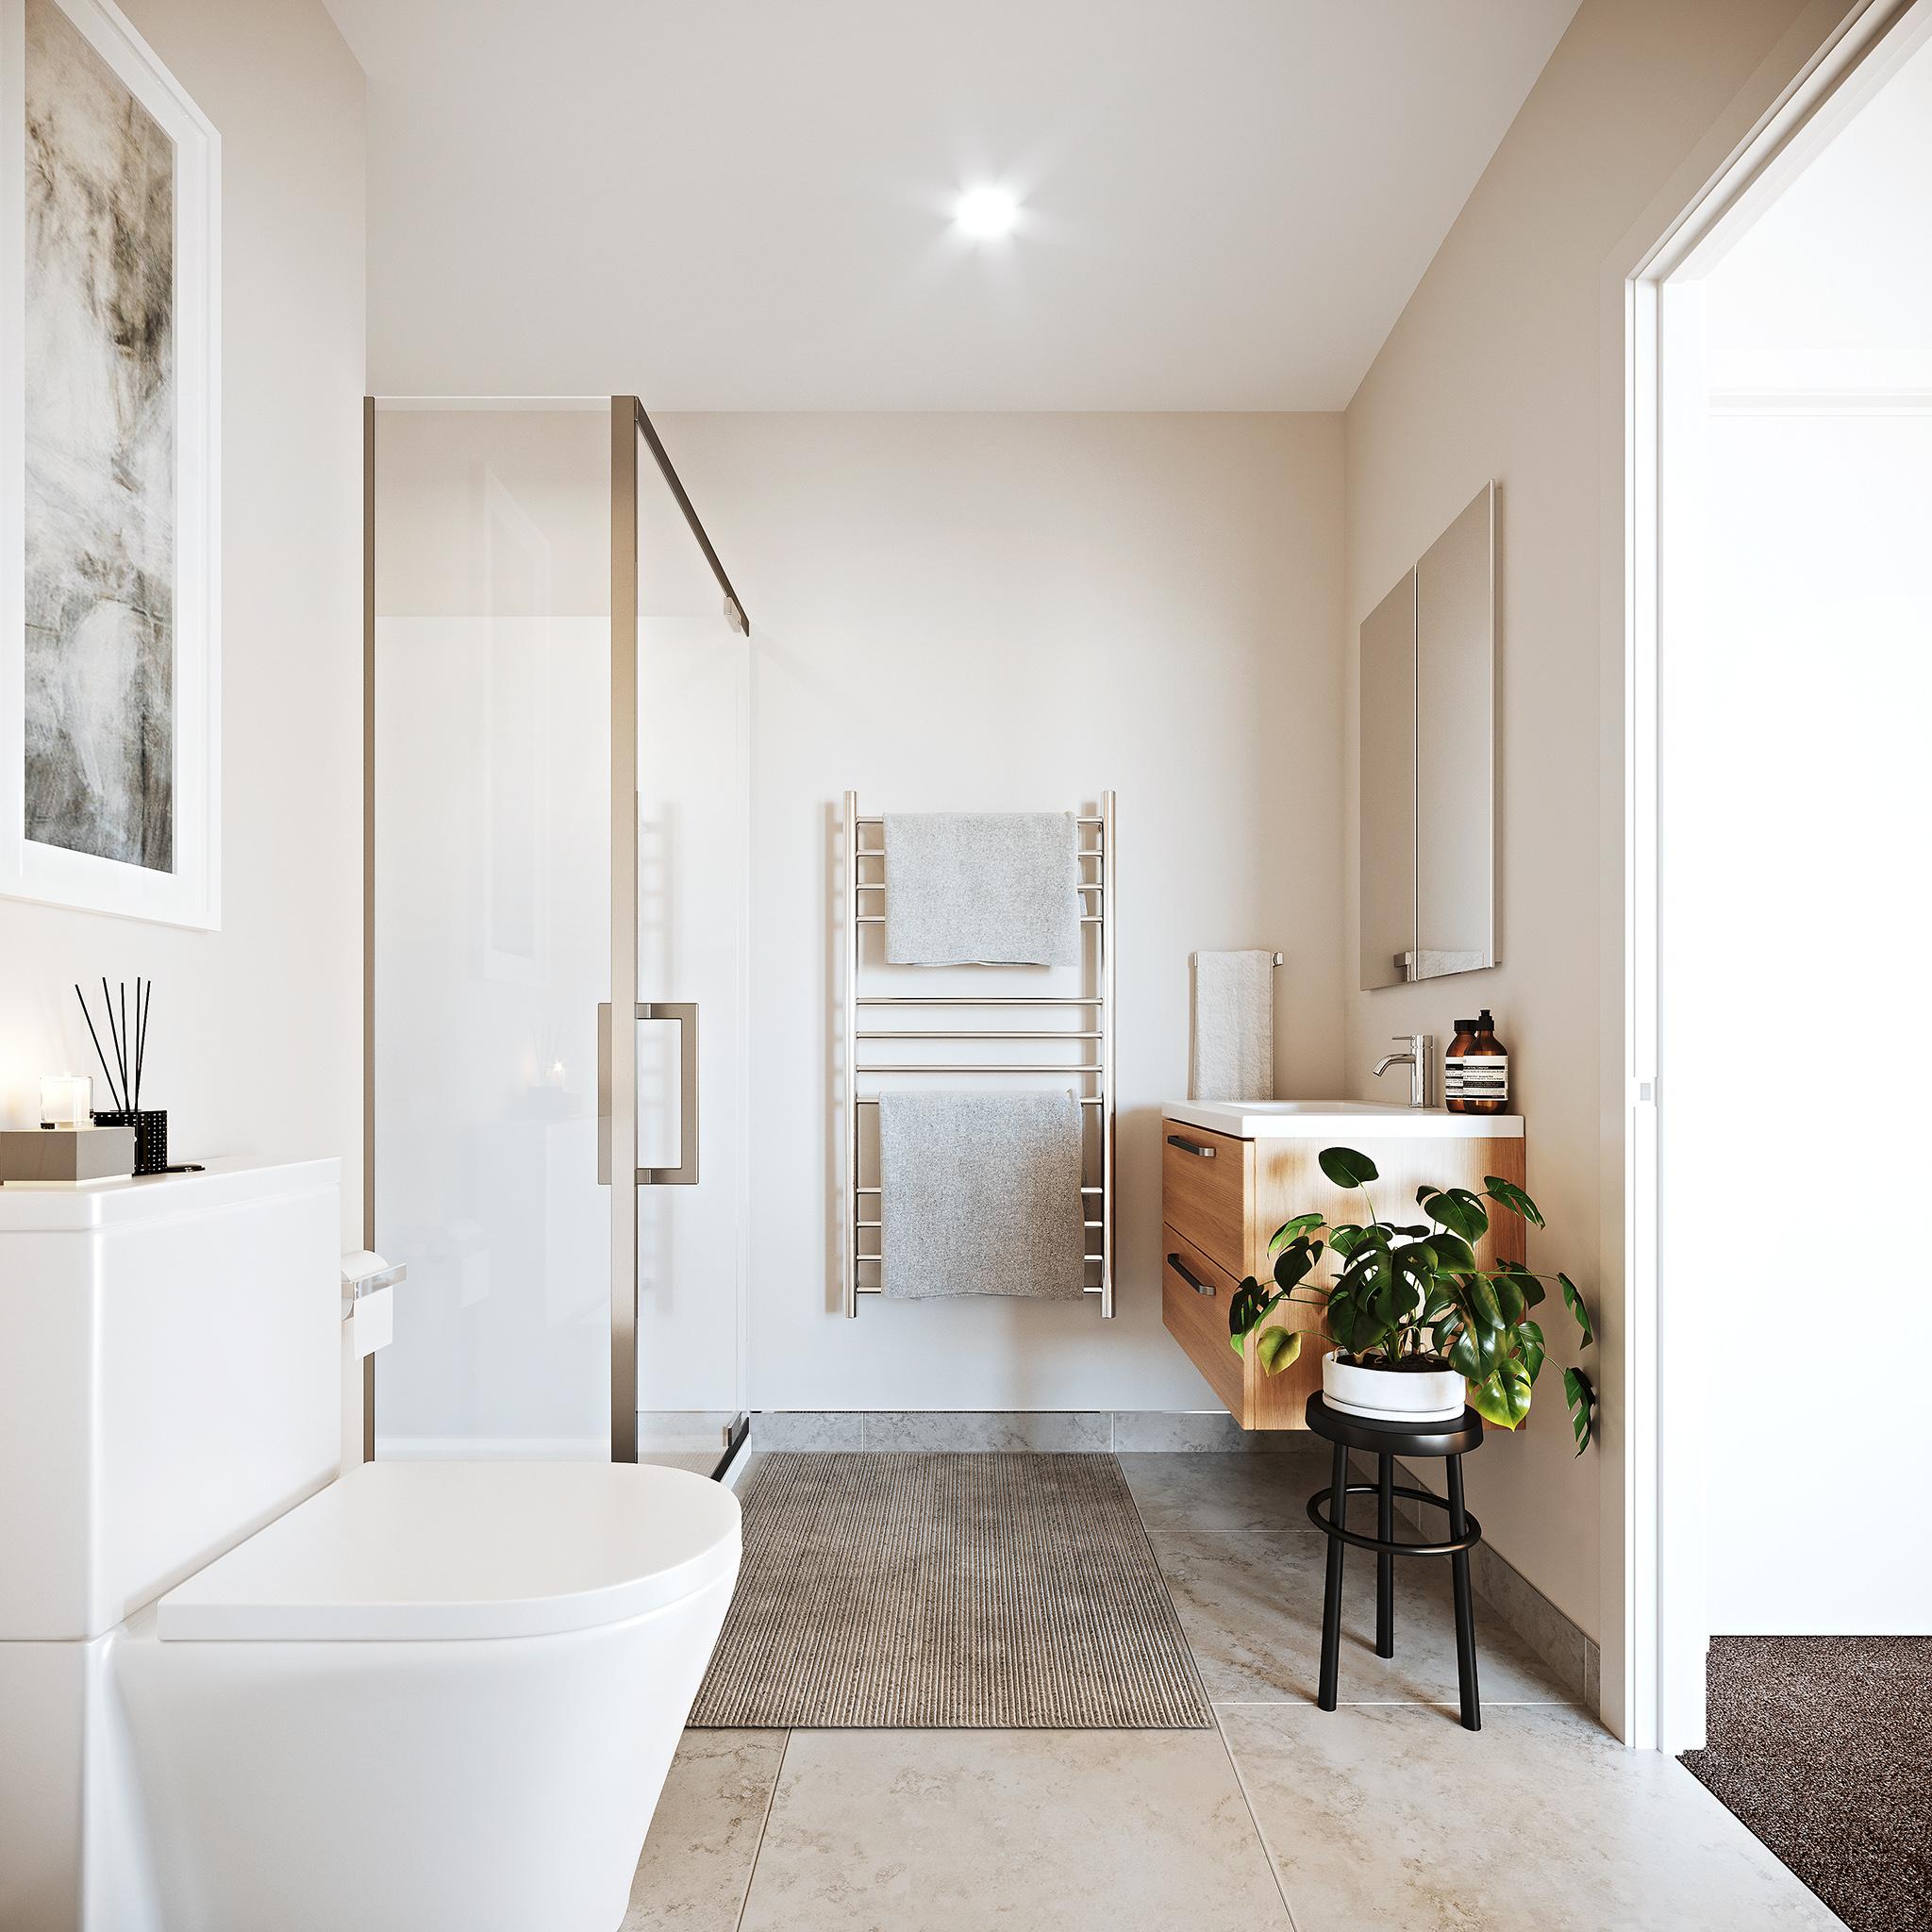 Remarkables Park Apartments_Int_A1_Bathroom_Final01.jpg